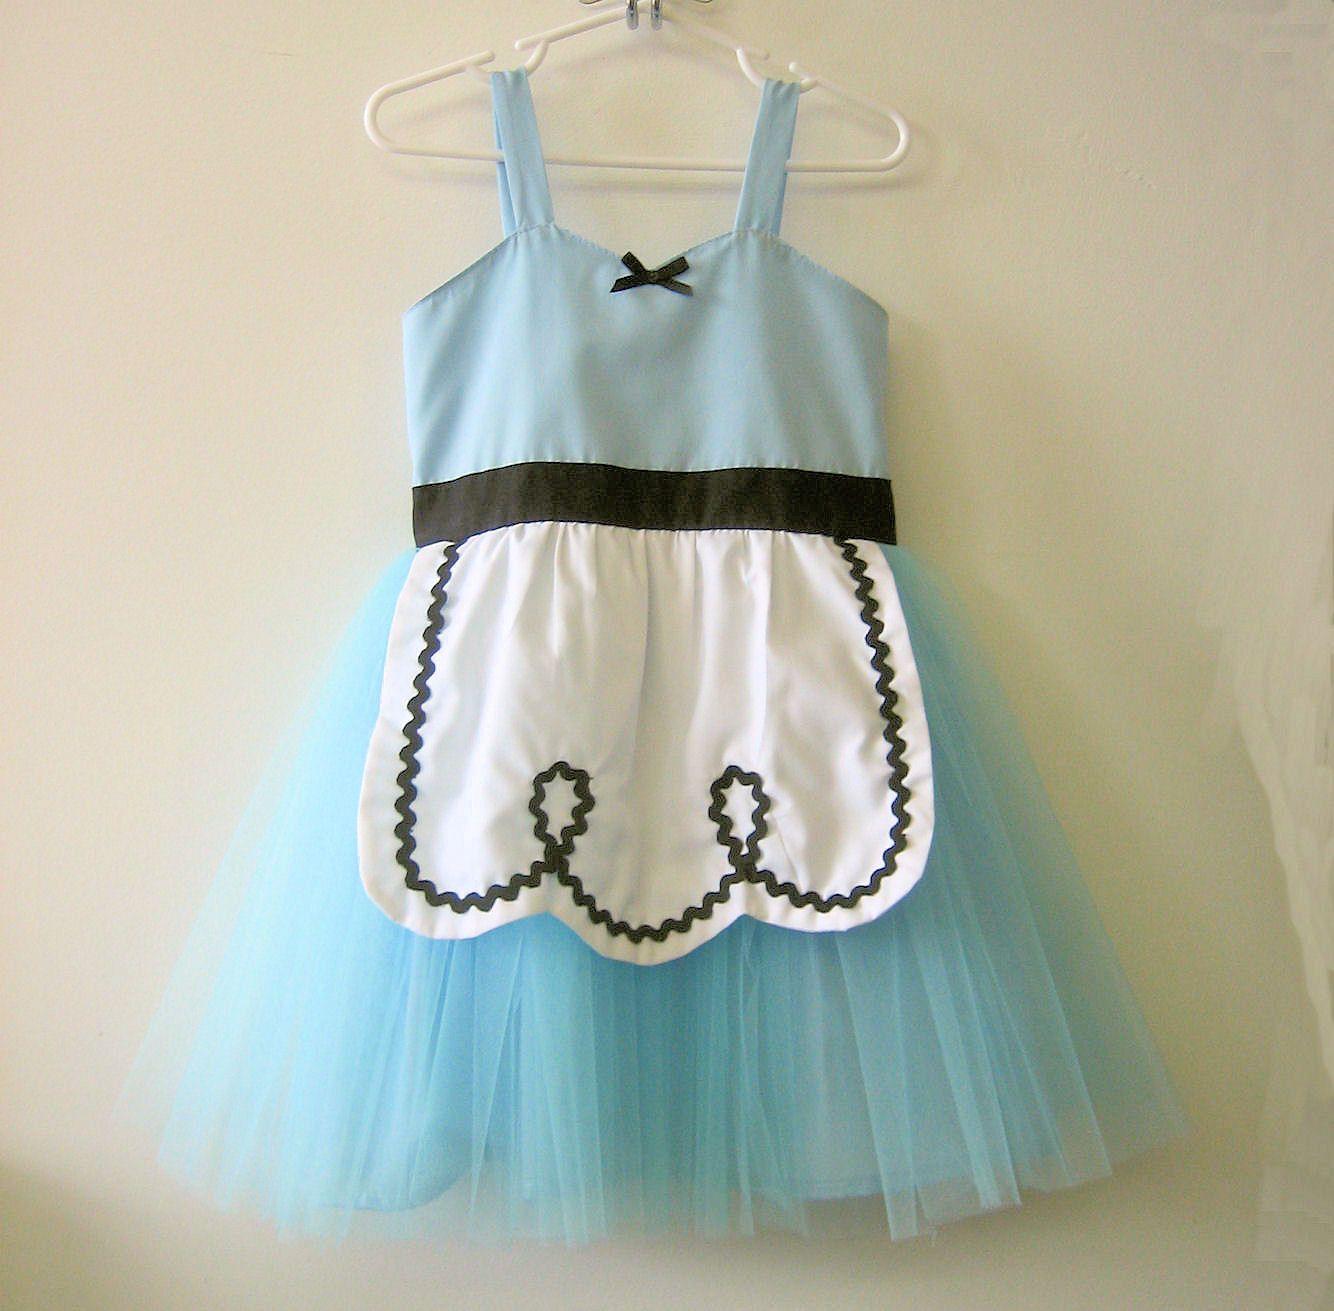 ALICE IN WONDERLAND dress retro Alice costume tutu dress for girls ...